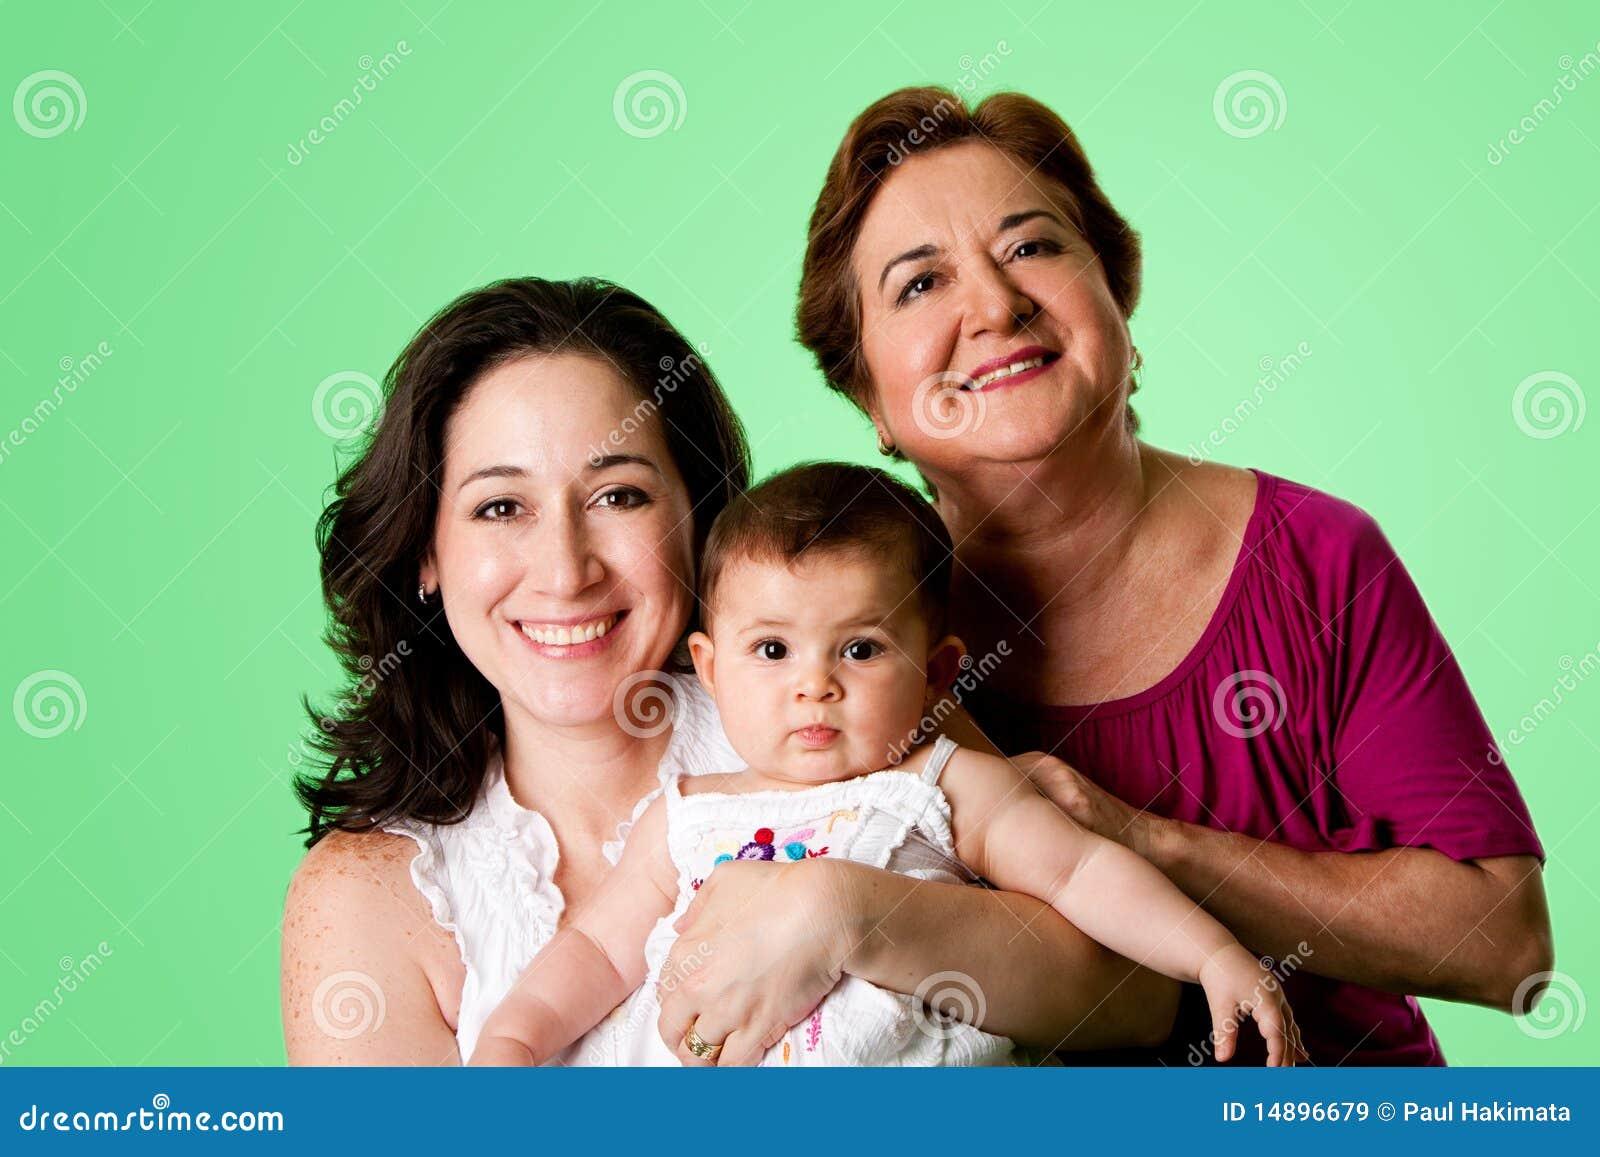 3 Generations of women